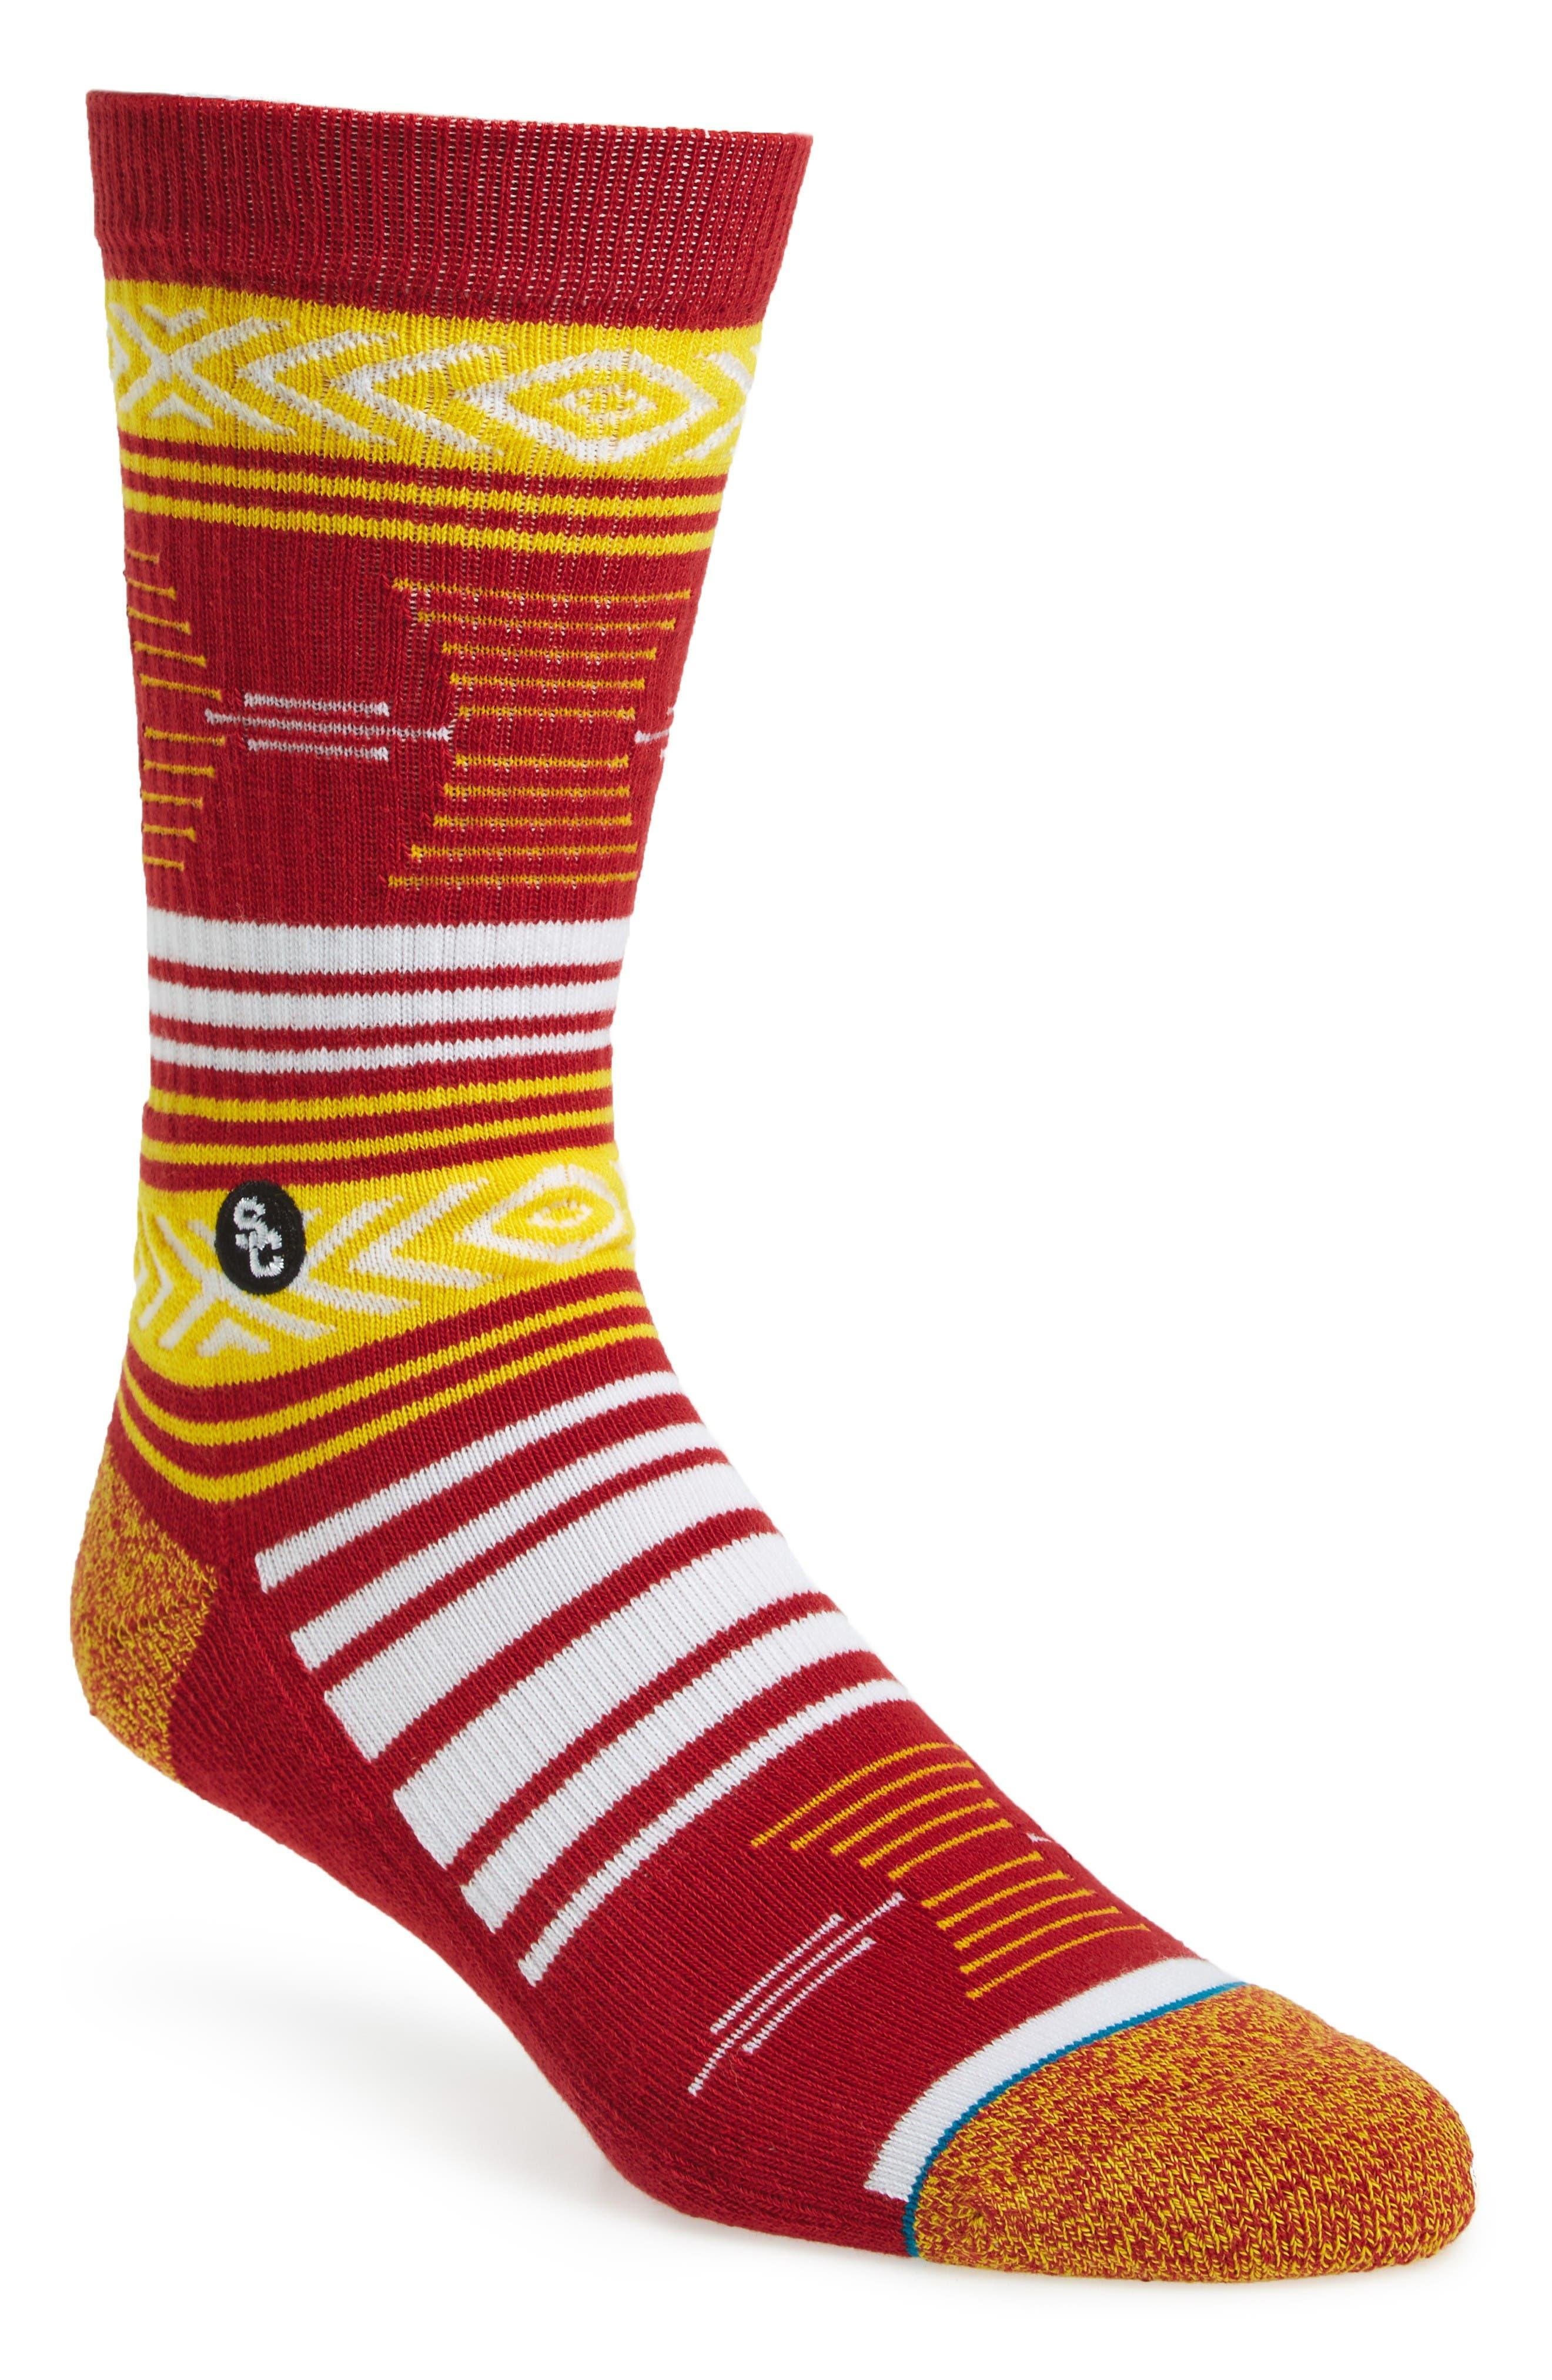 Mazed USC Trojans Socks,                             Main thumbnail 1, color,                             Cardinal